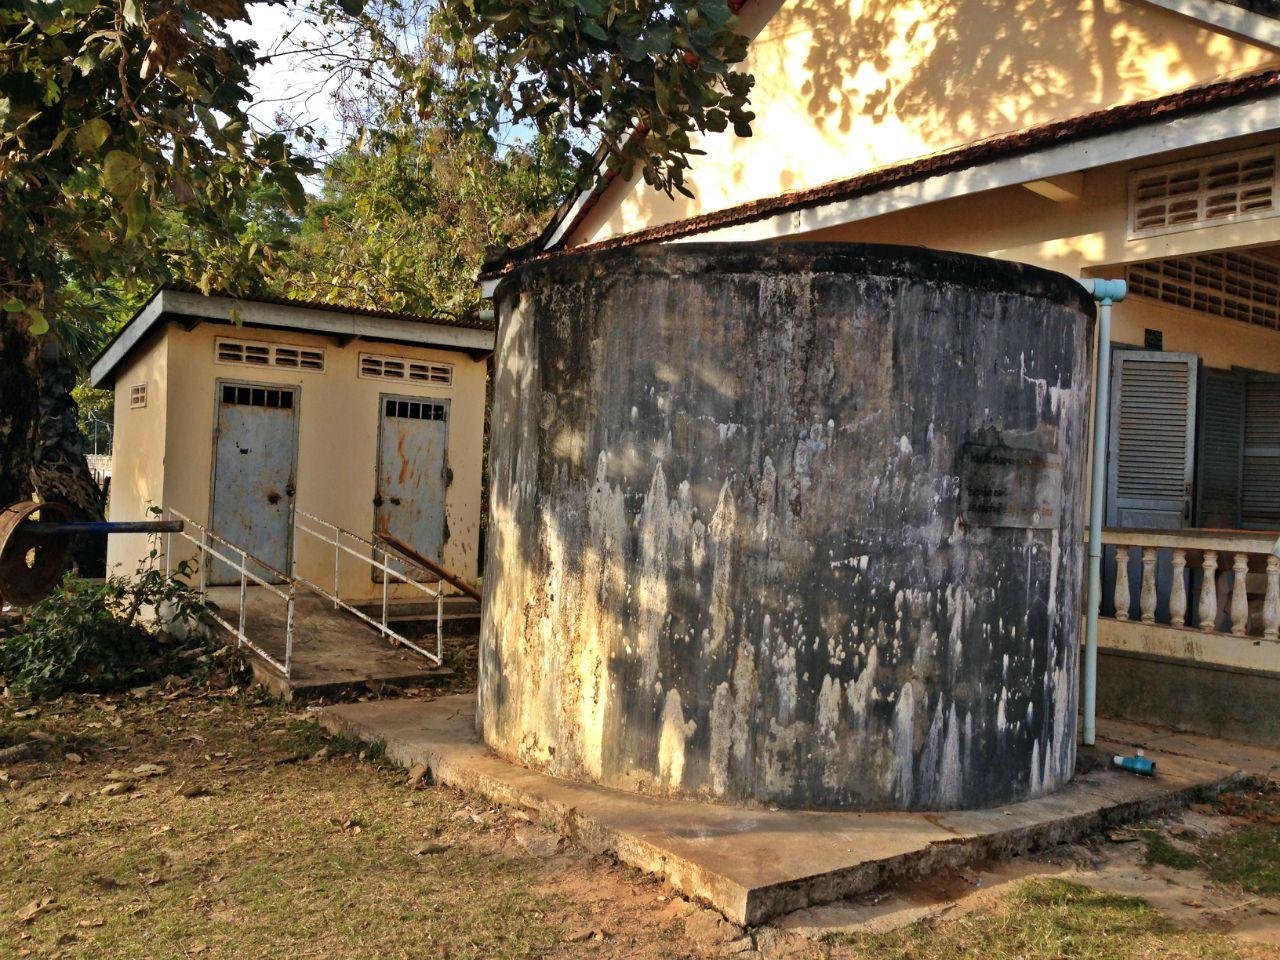 Chheuteal Primary School Bathroom Project - Cambodia